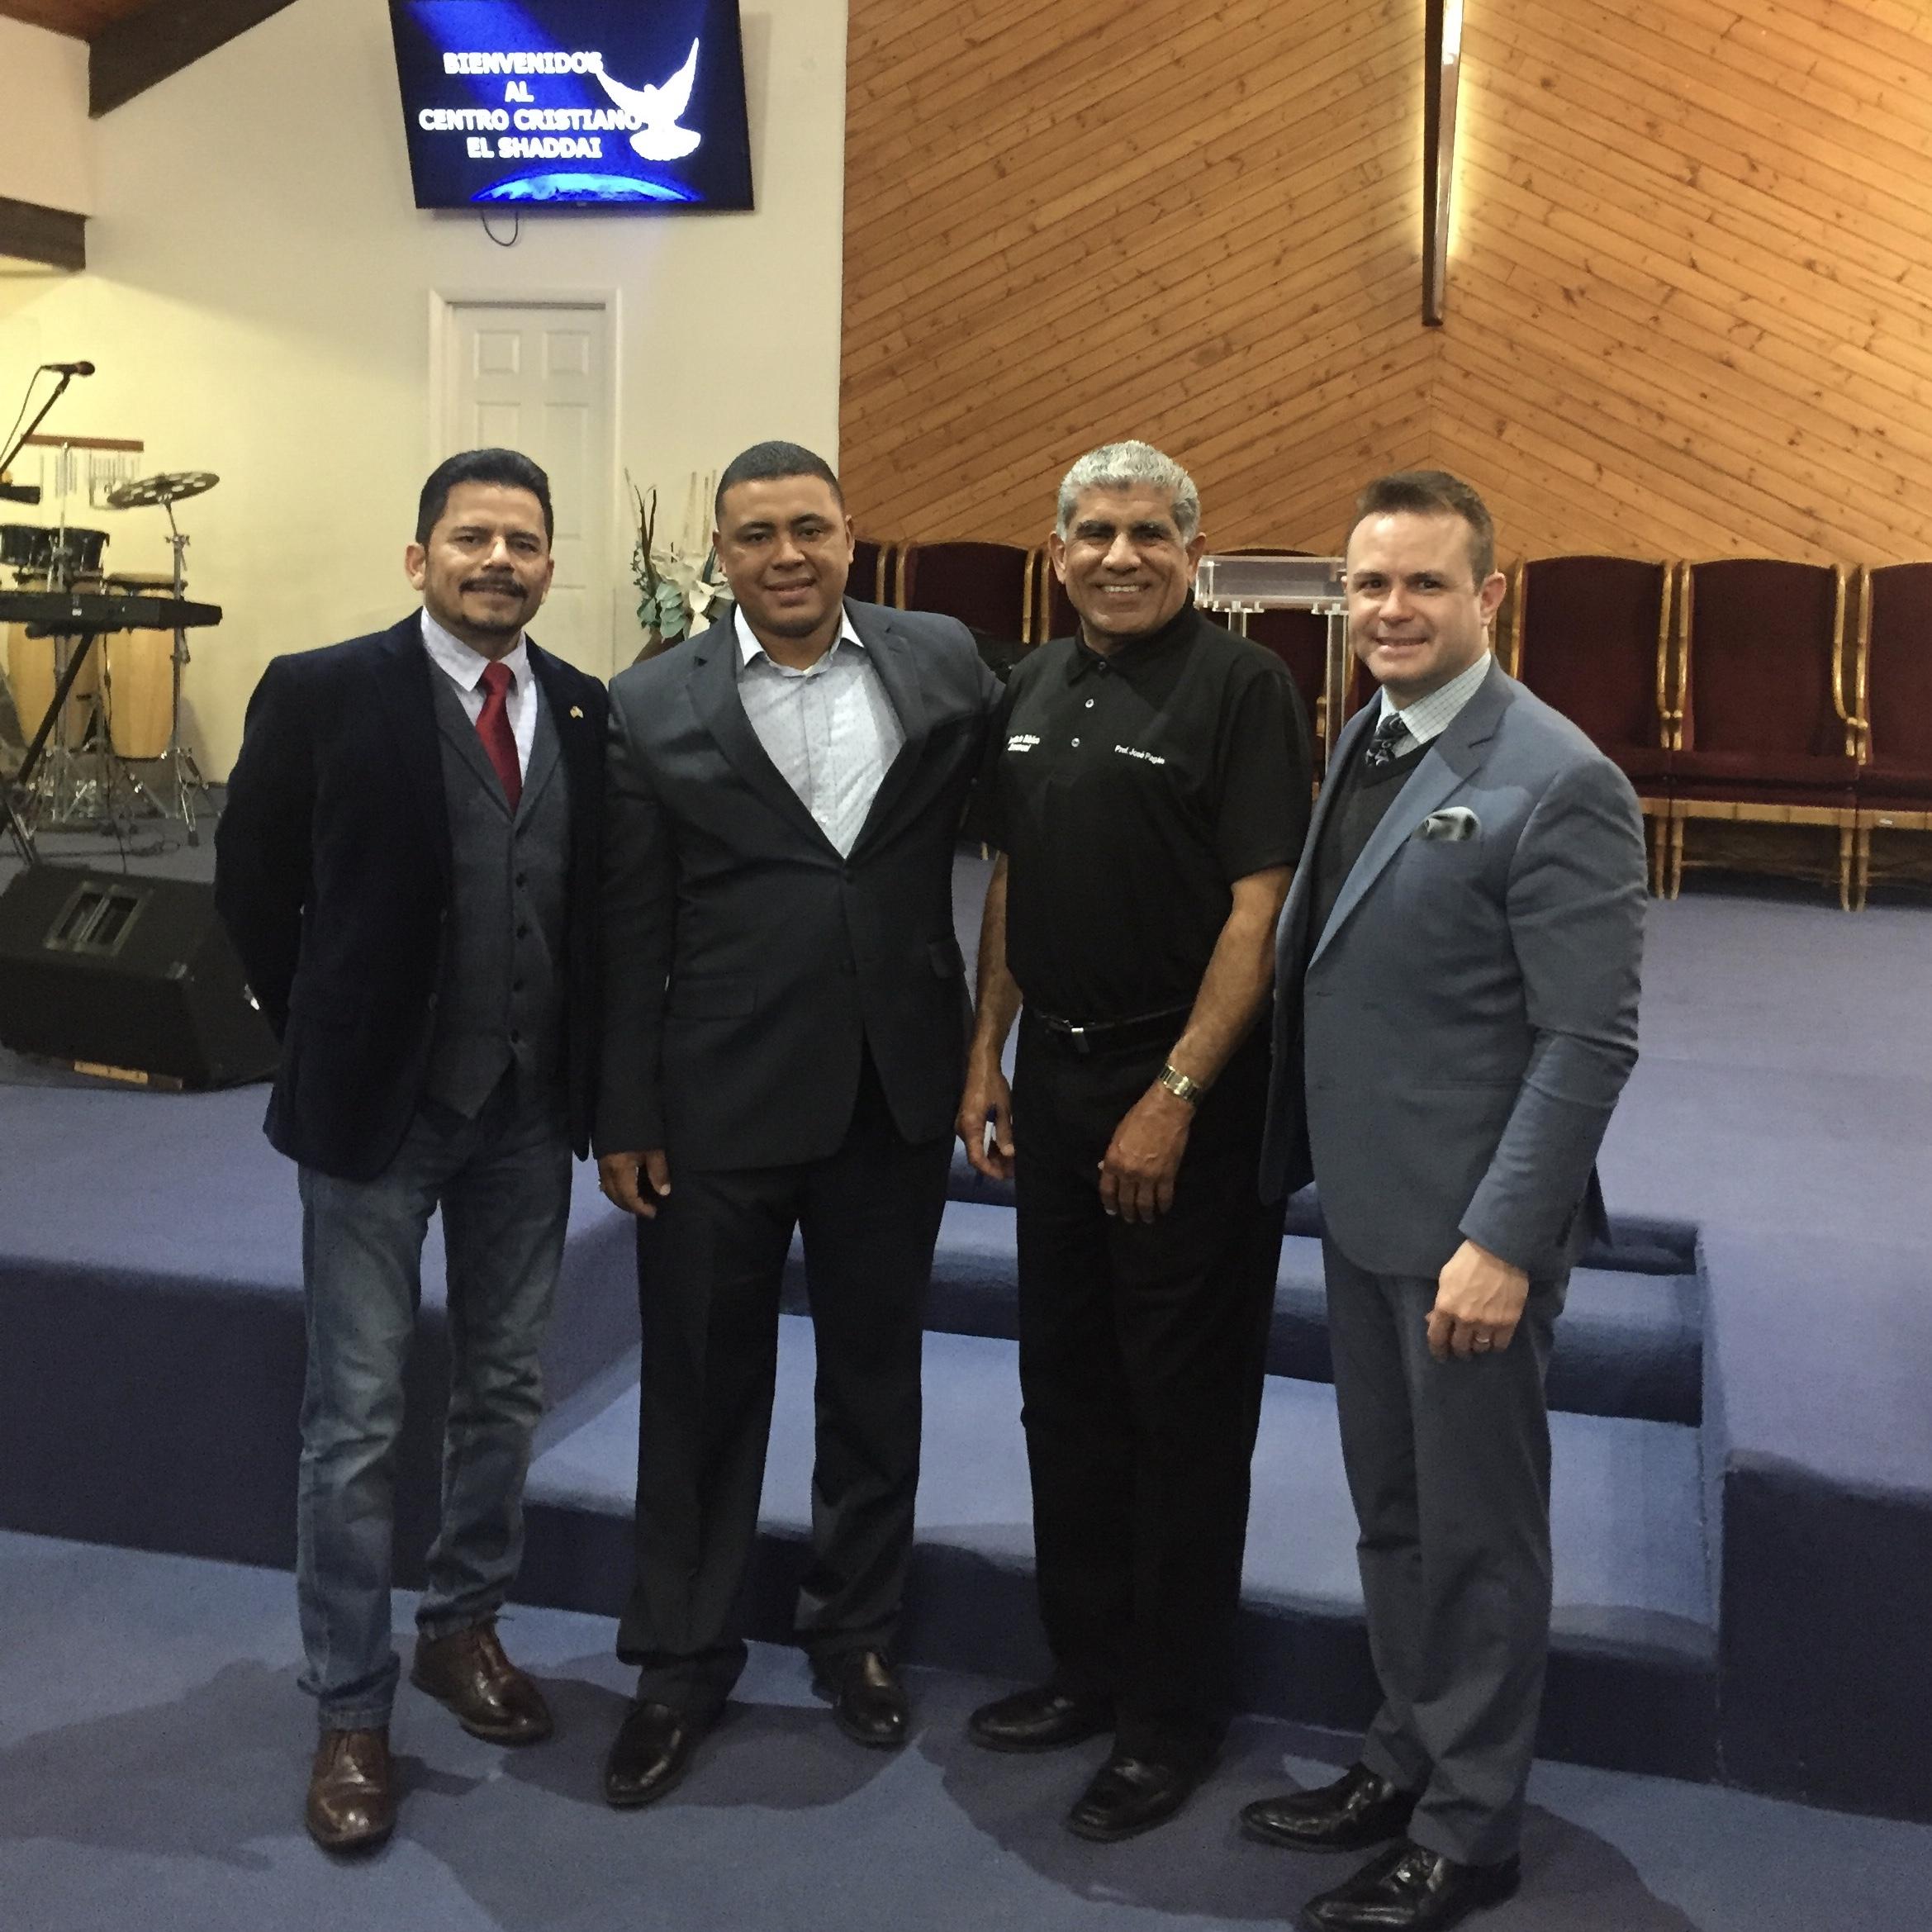 Feb 12 Las Vegas, NV Spanish Pastors Luncheon